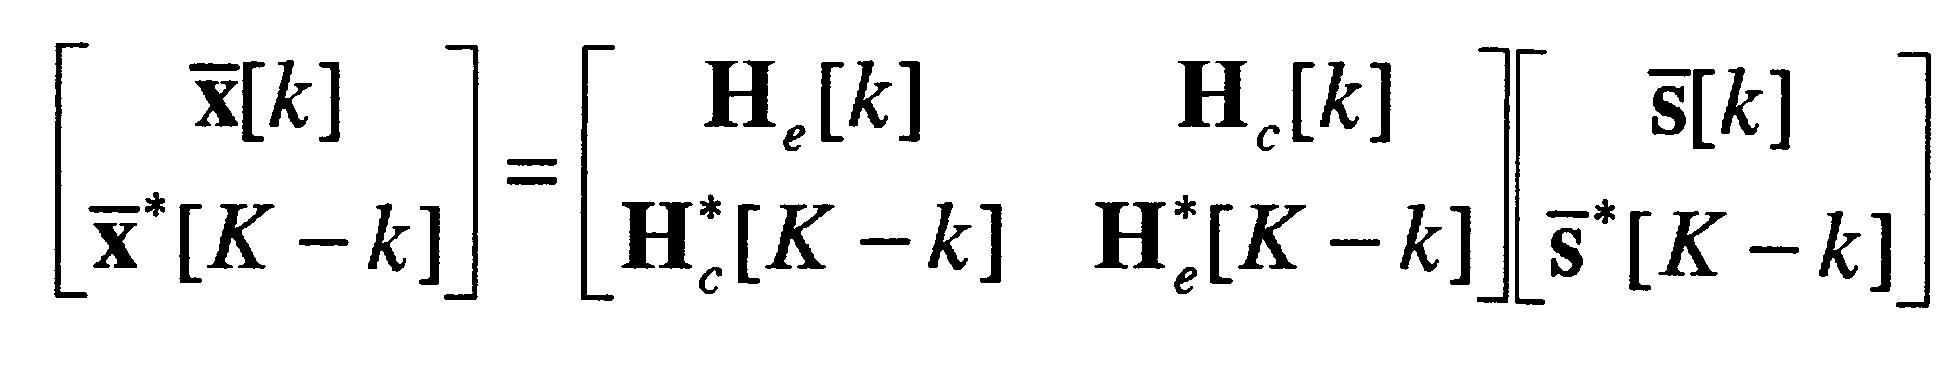 Figure 112015010005017-pat00011